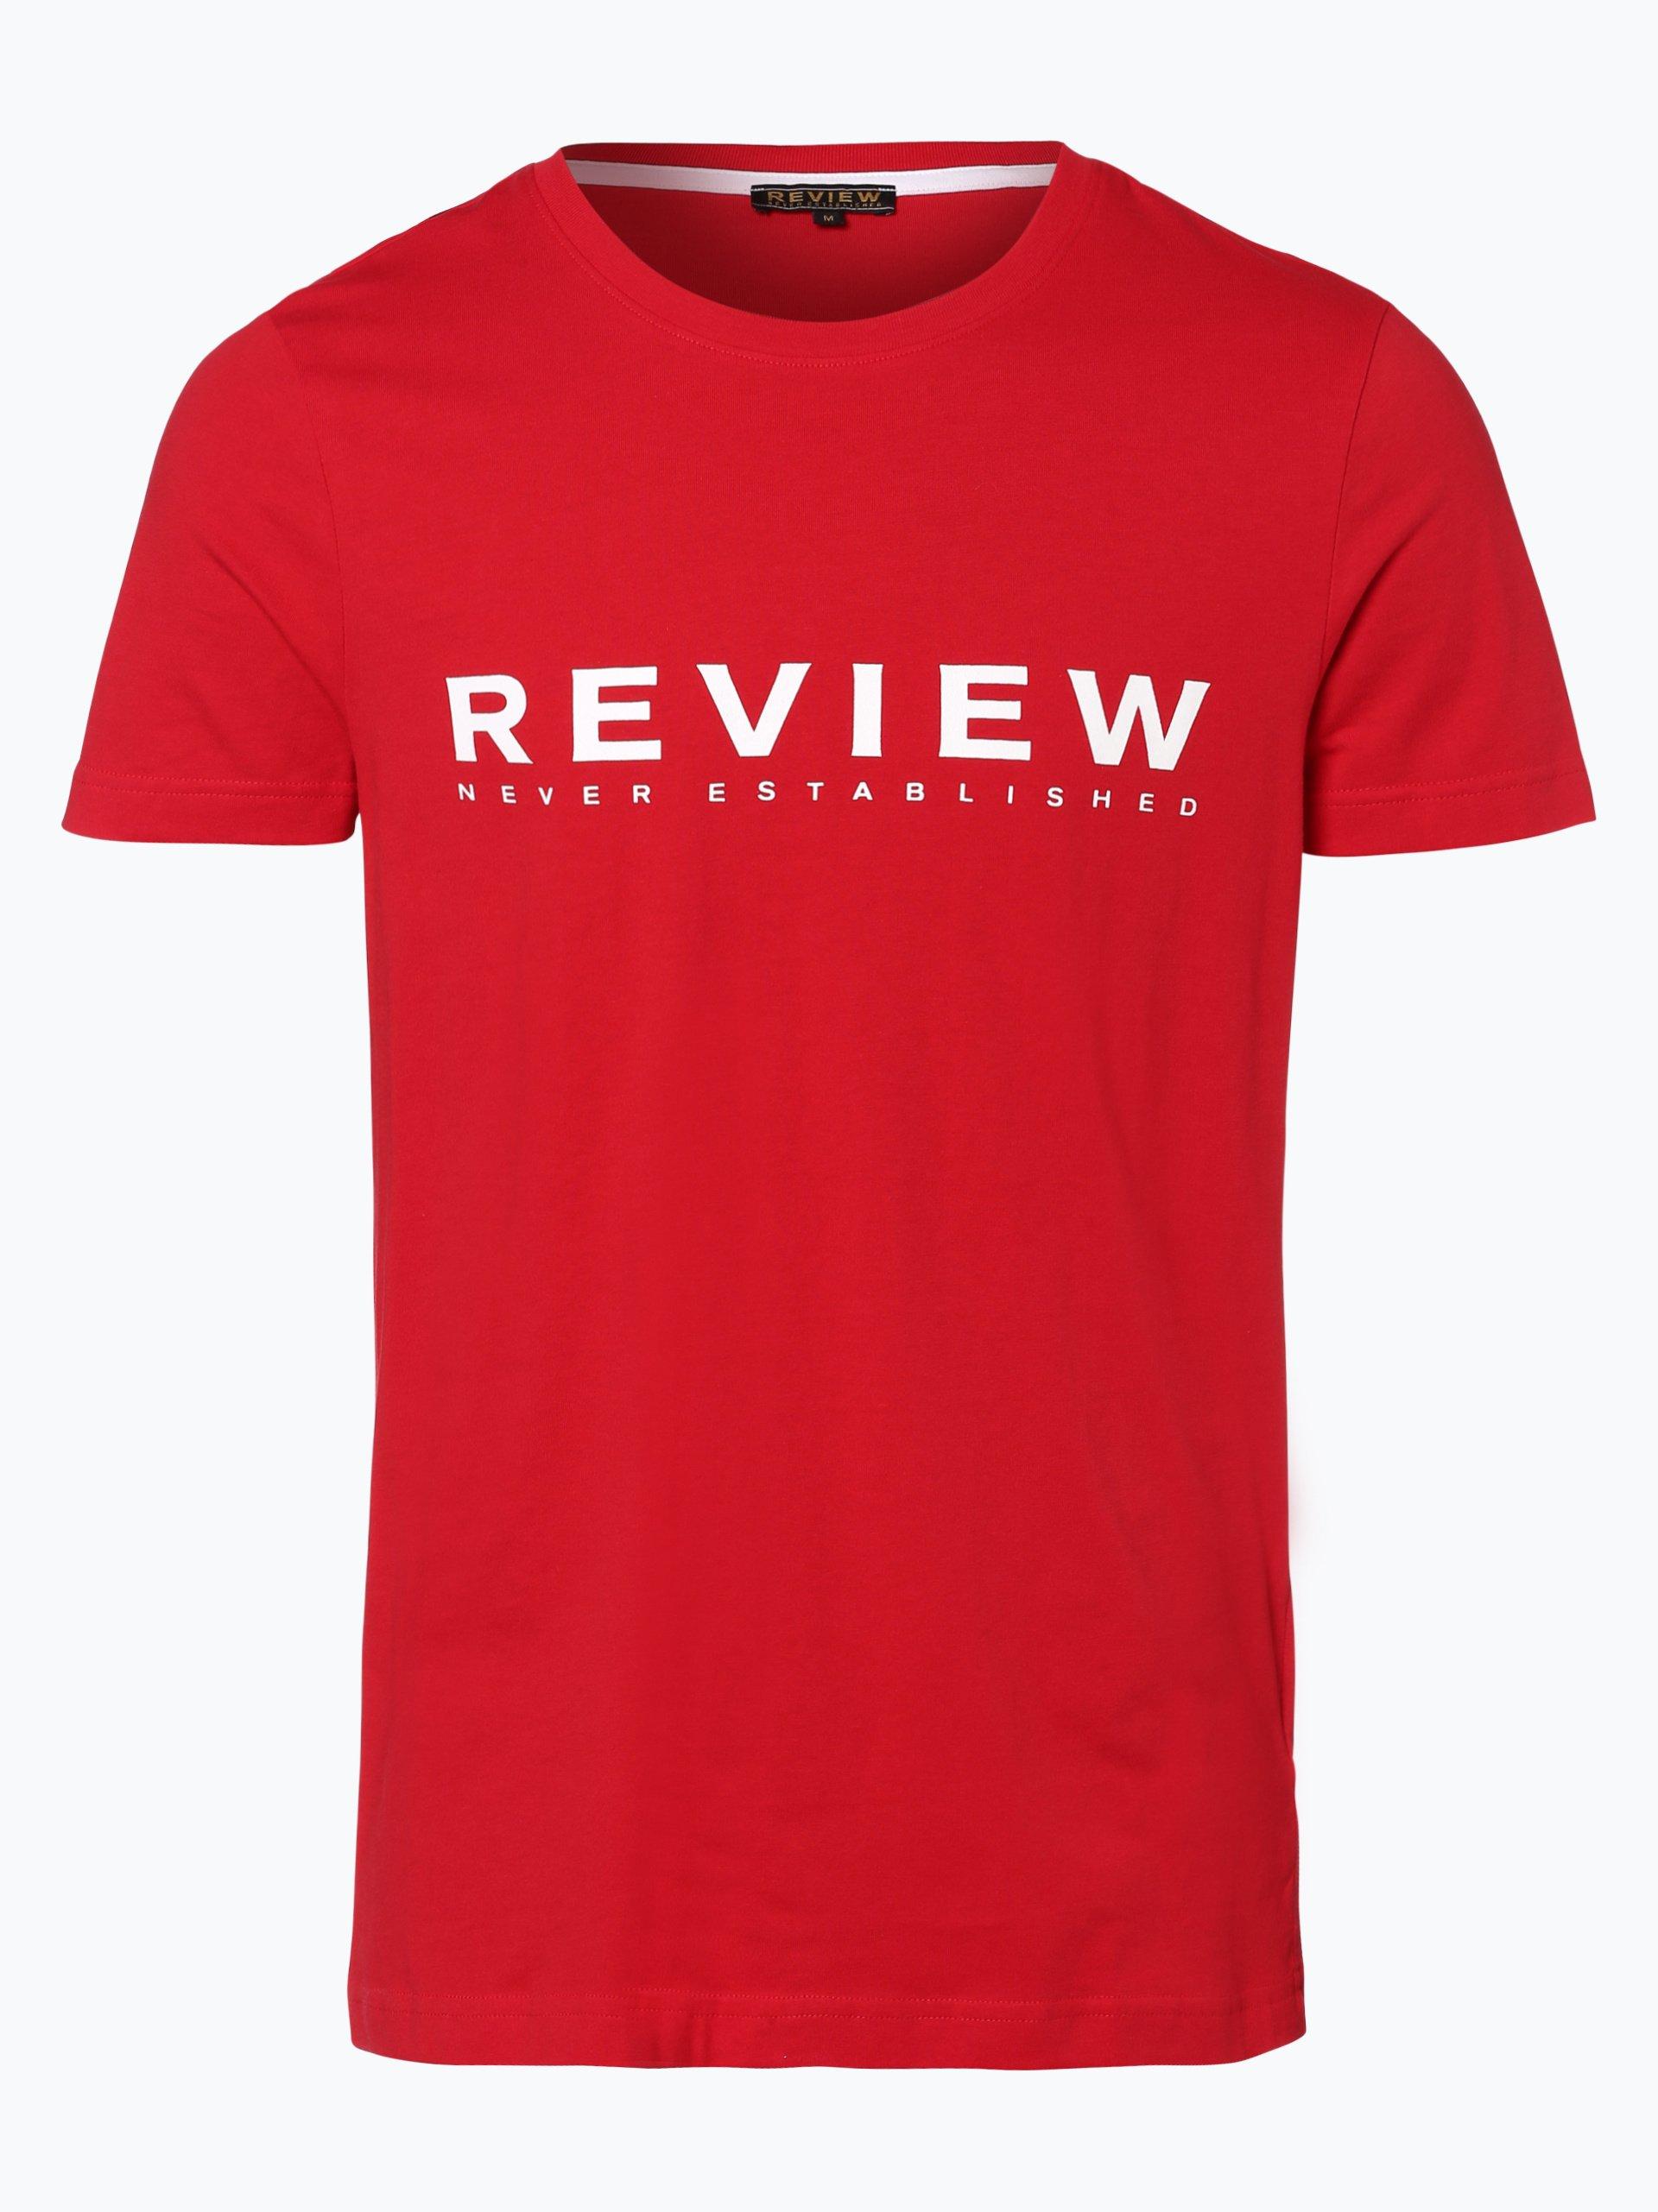 review herren t shirt rot gemustert online kaufen. Black Bedroom Furniture Sets. Home Design Ideas